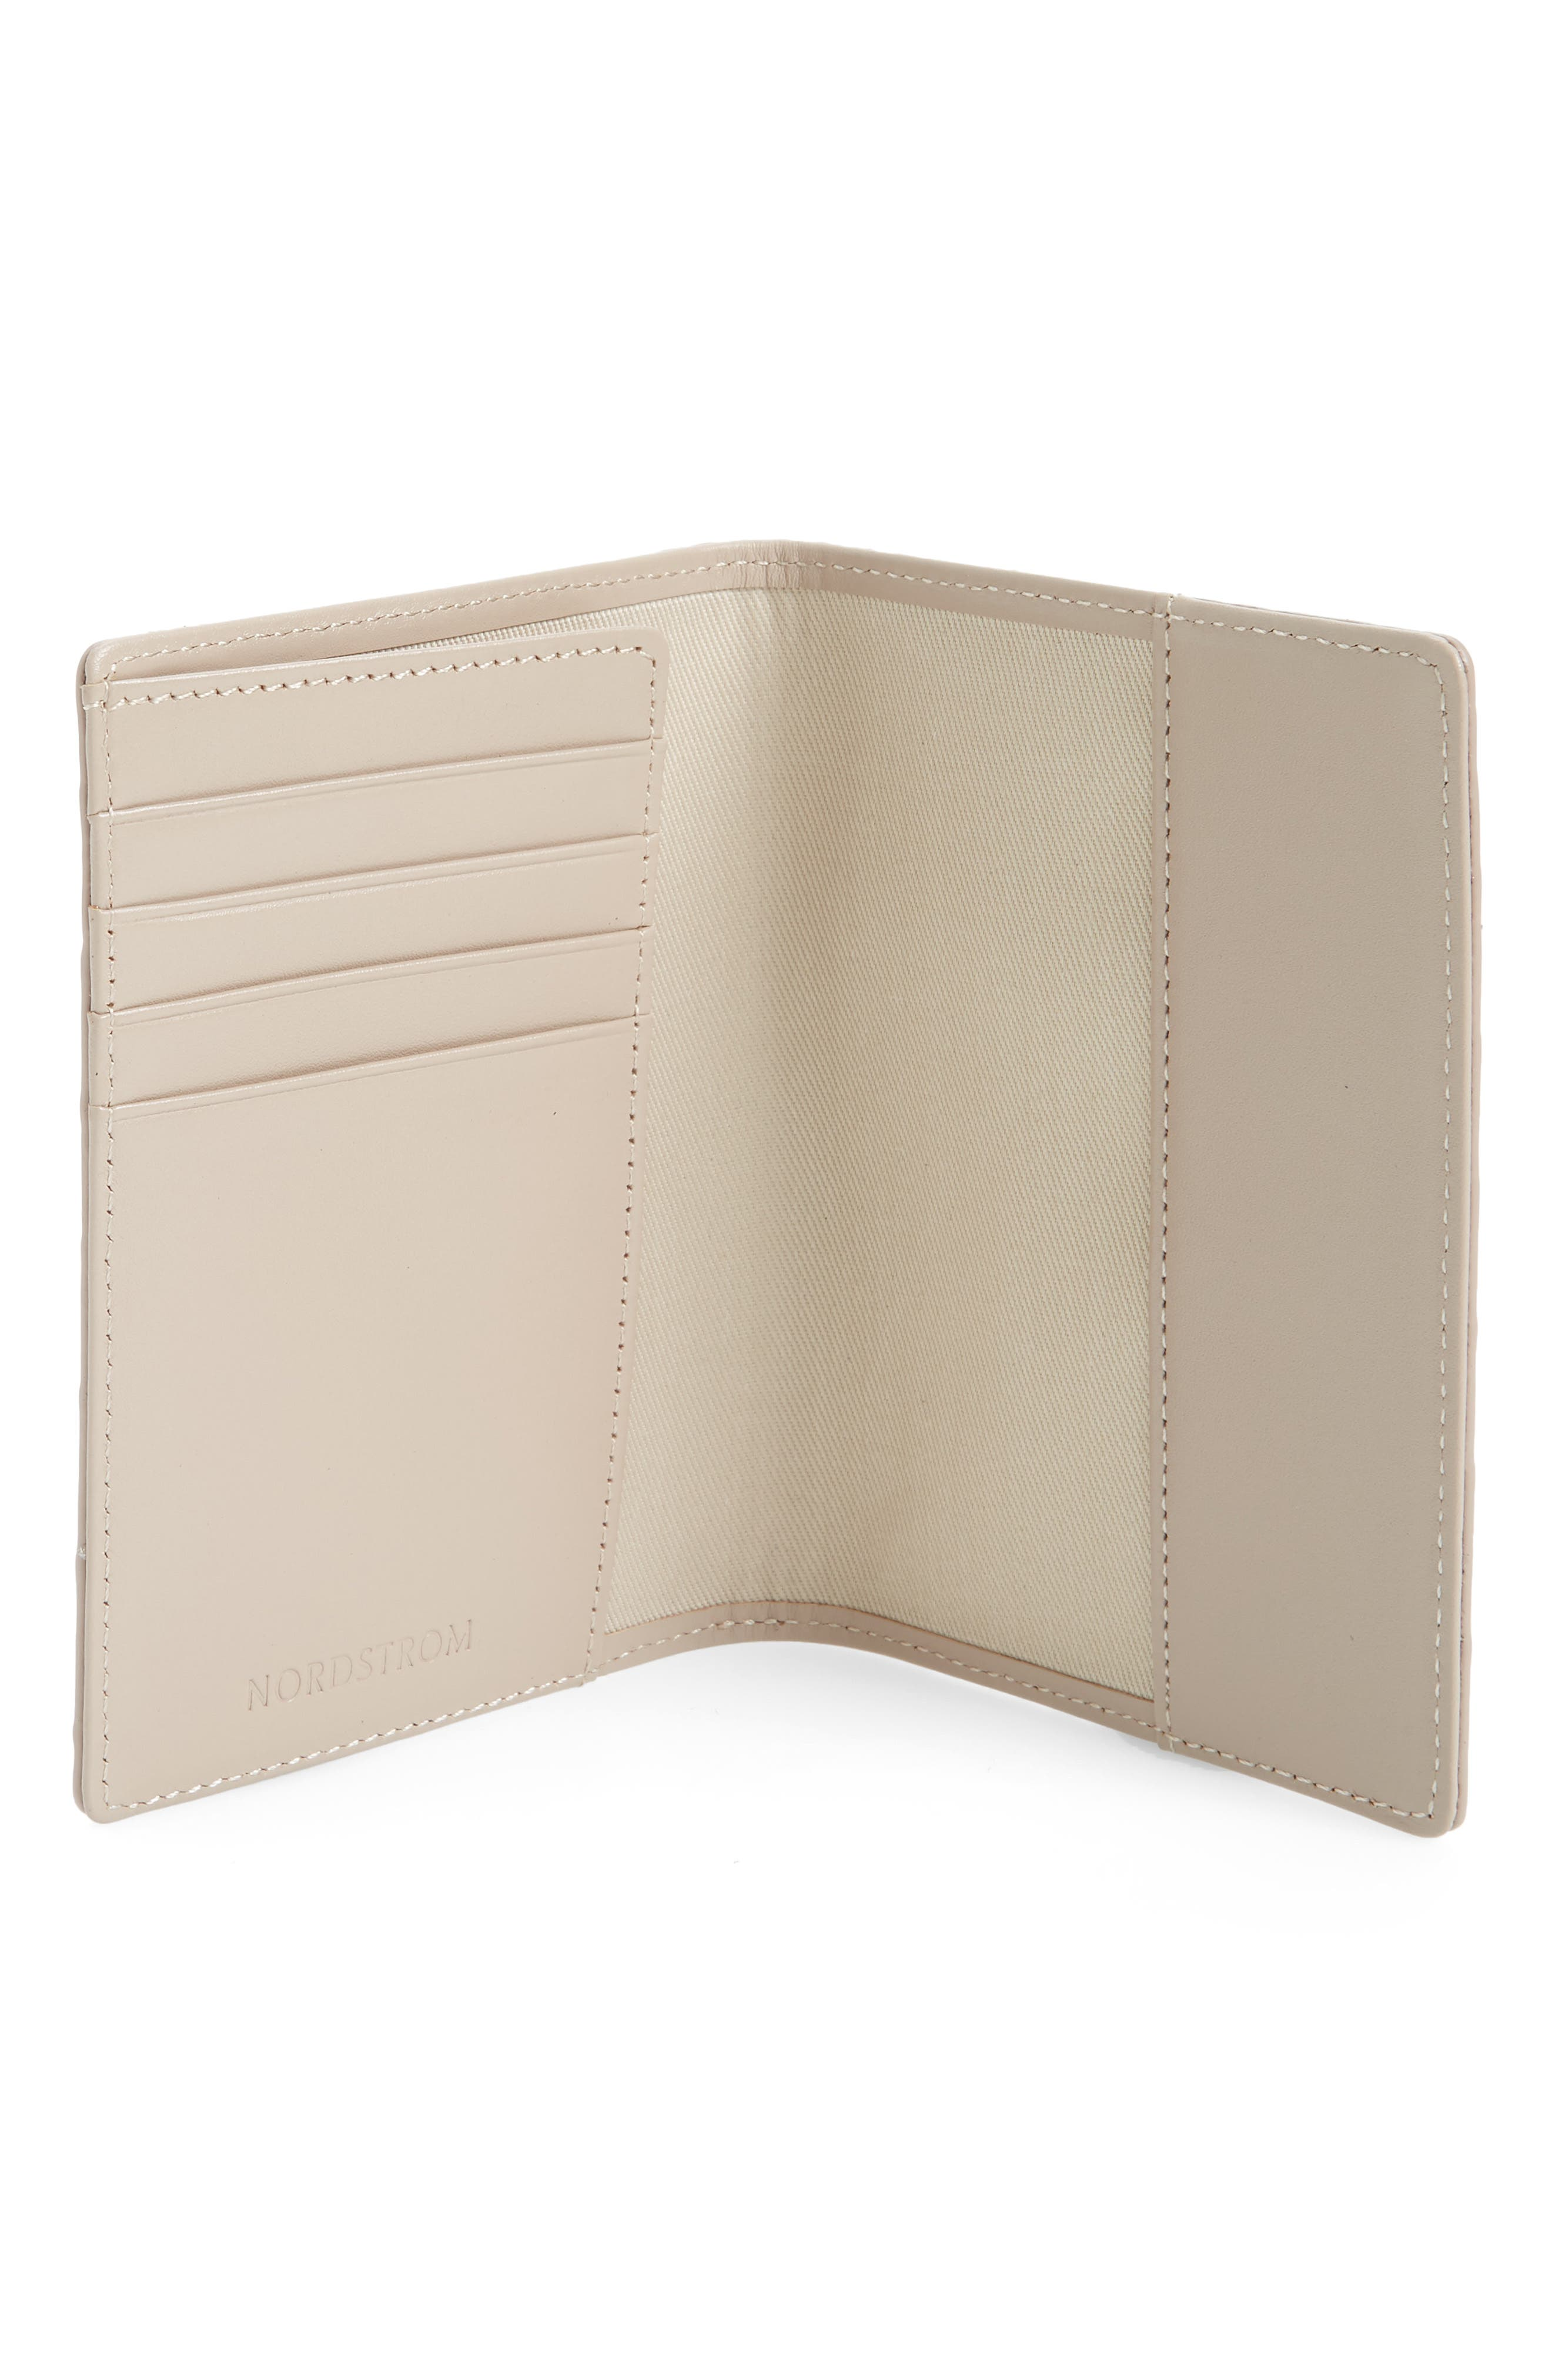 Croc Embossed Leather Passport Holder,                             Alternate thumbnail 2, color,                             GREY BARK